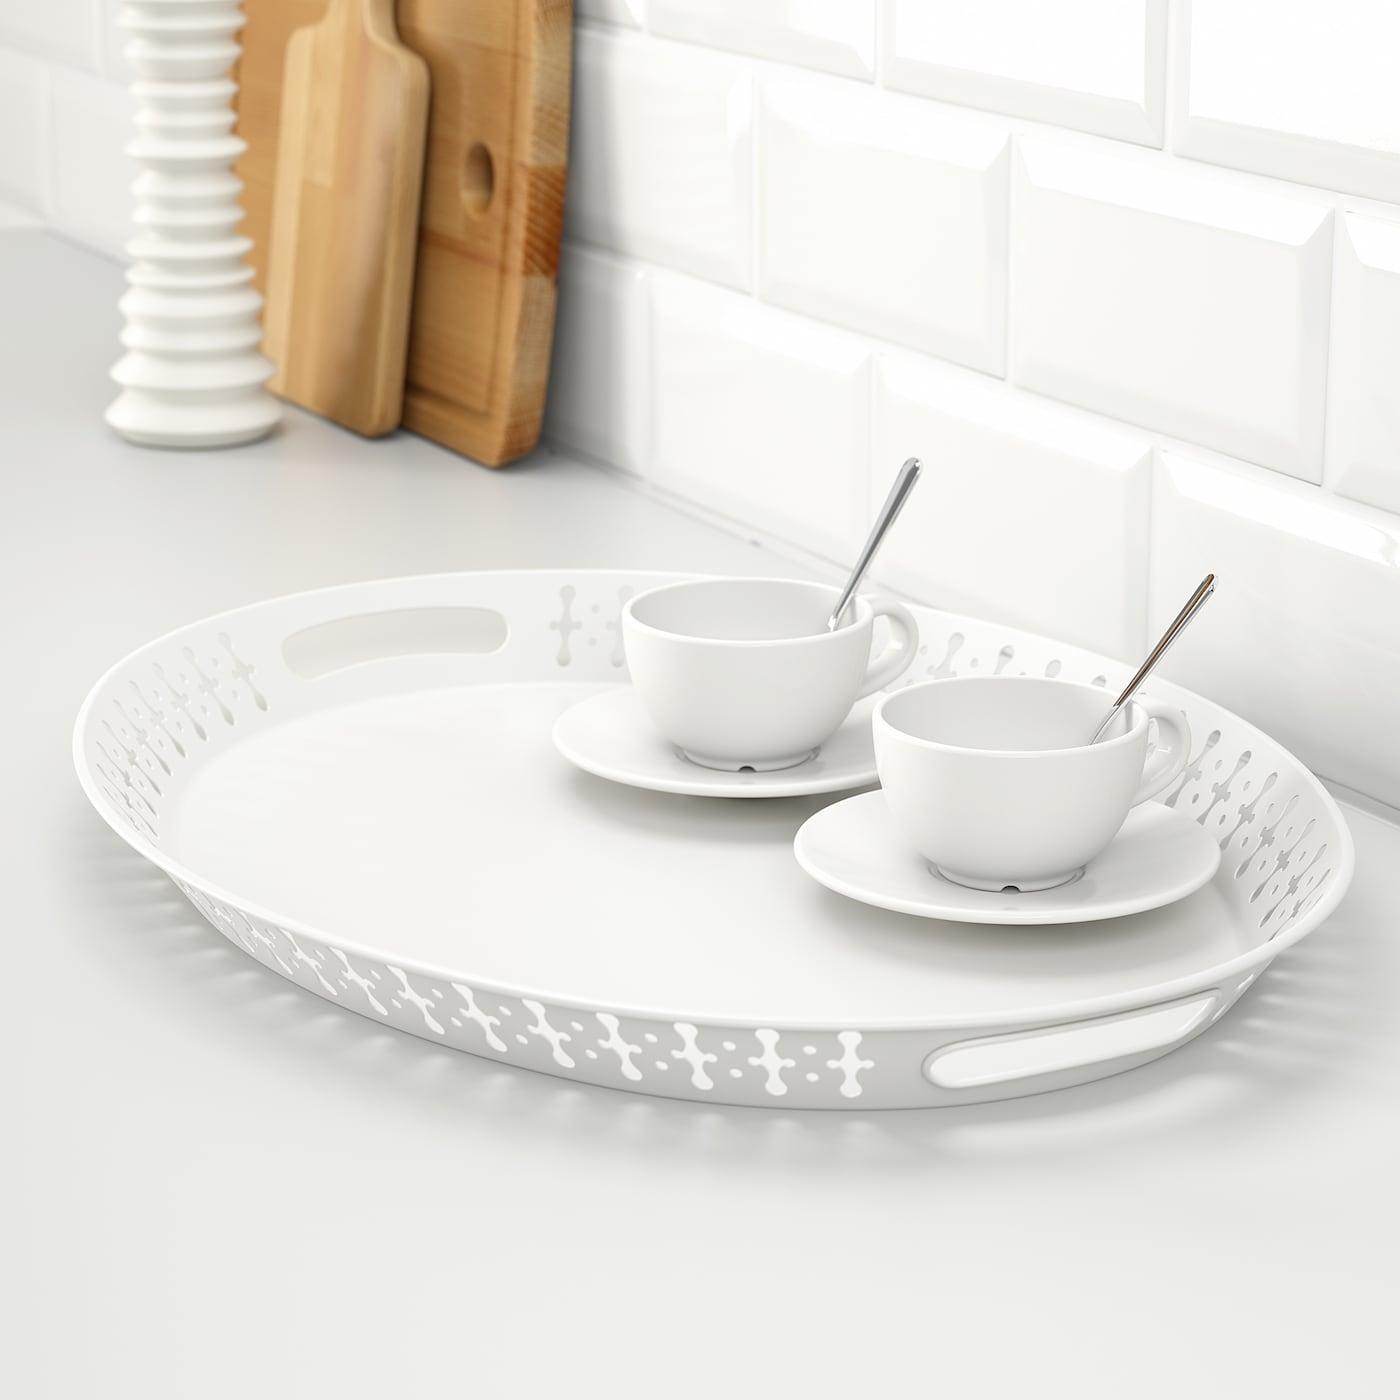 Ikea ROMANTISK Tray, white 52x39 cm